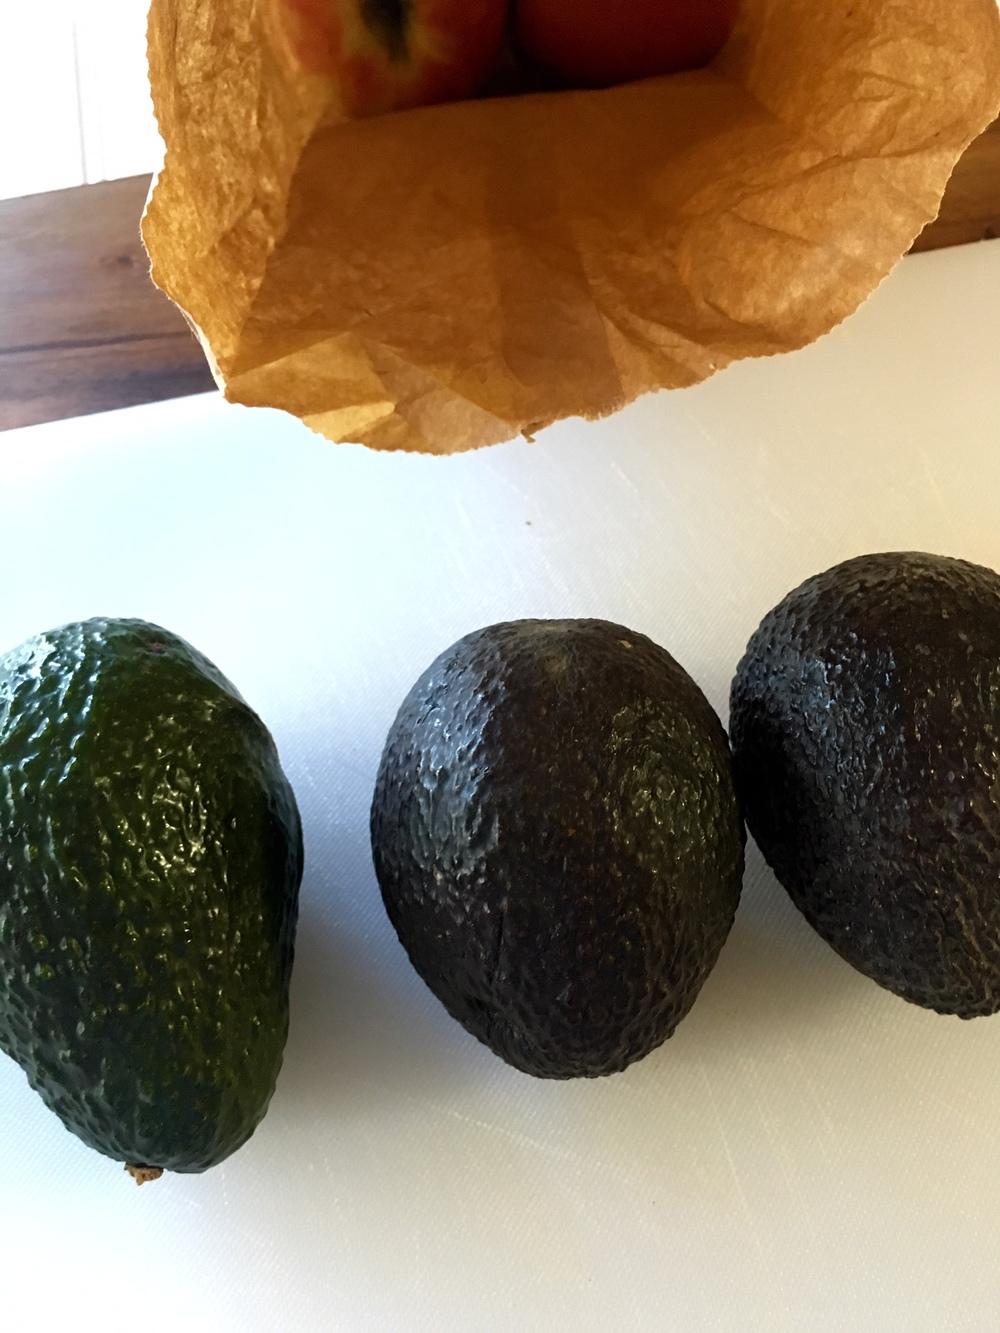 how to store open avocado